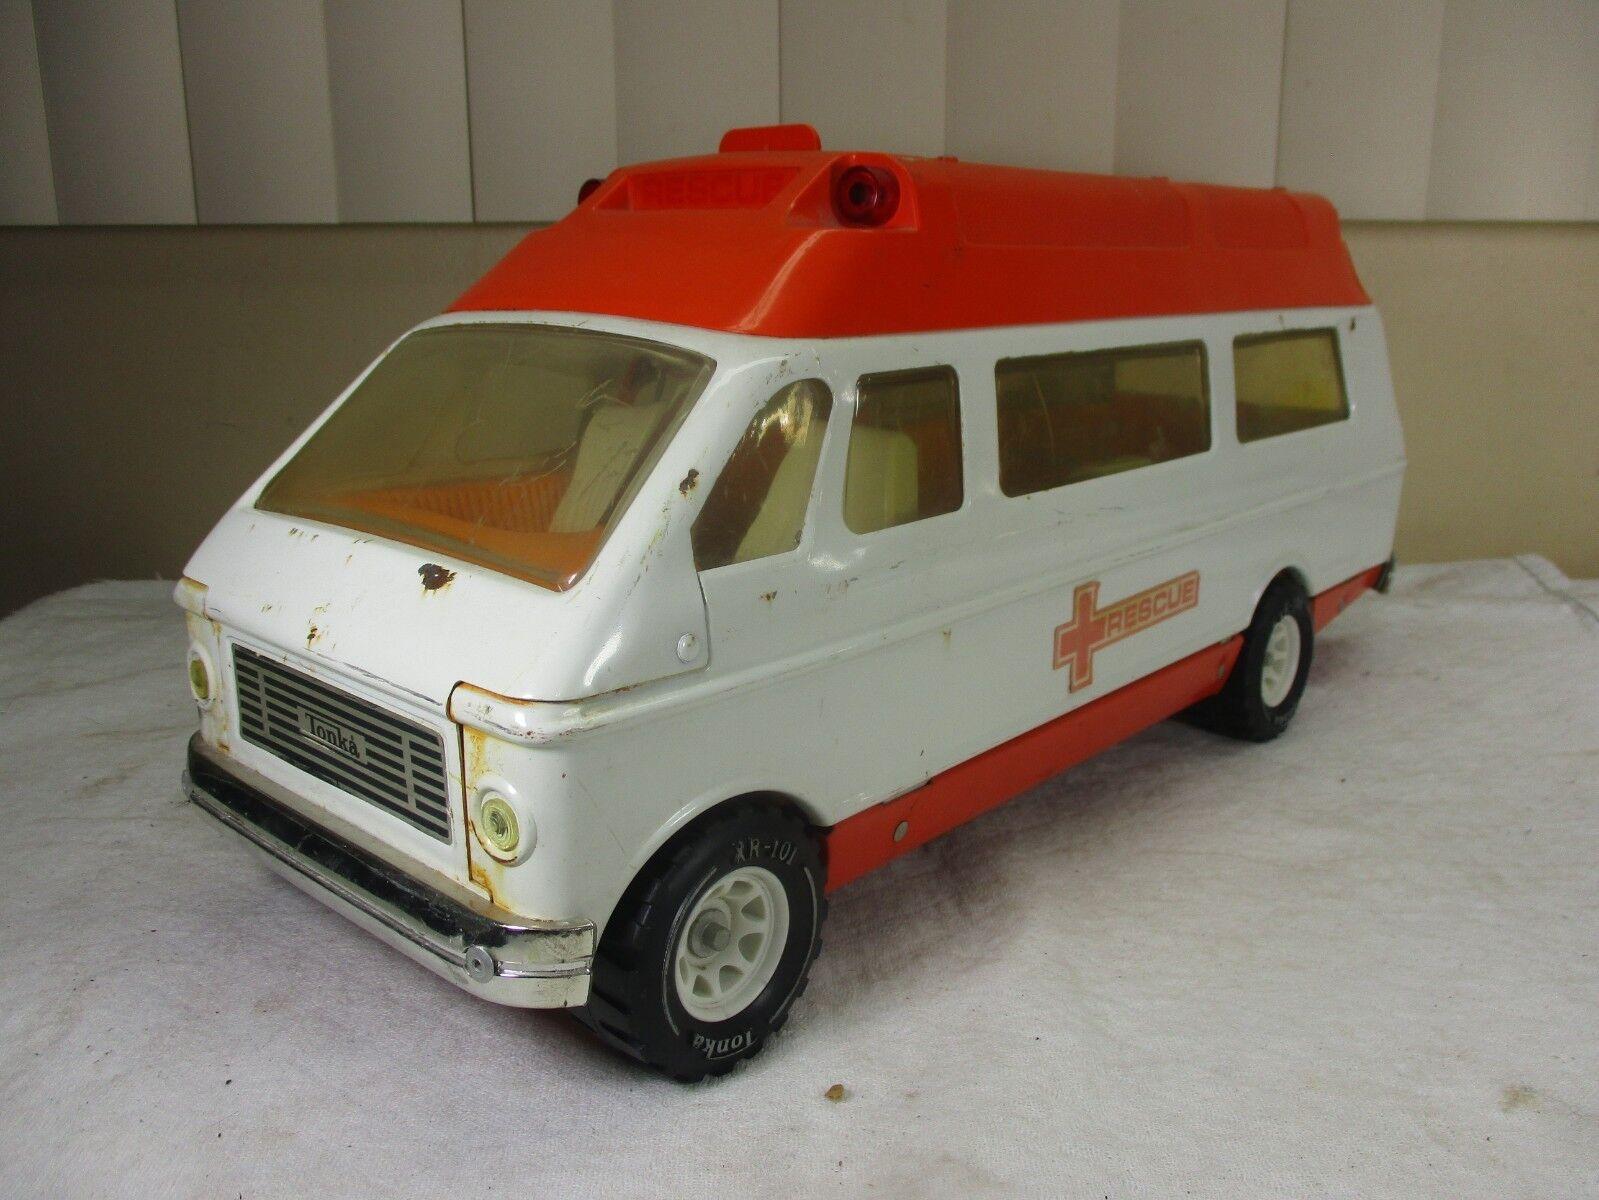 Vtg Tonka Pressed Steel Rescue Emergency Ambulance Van Vehicle & Stretcher 1970s